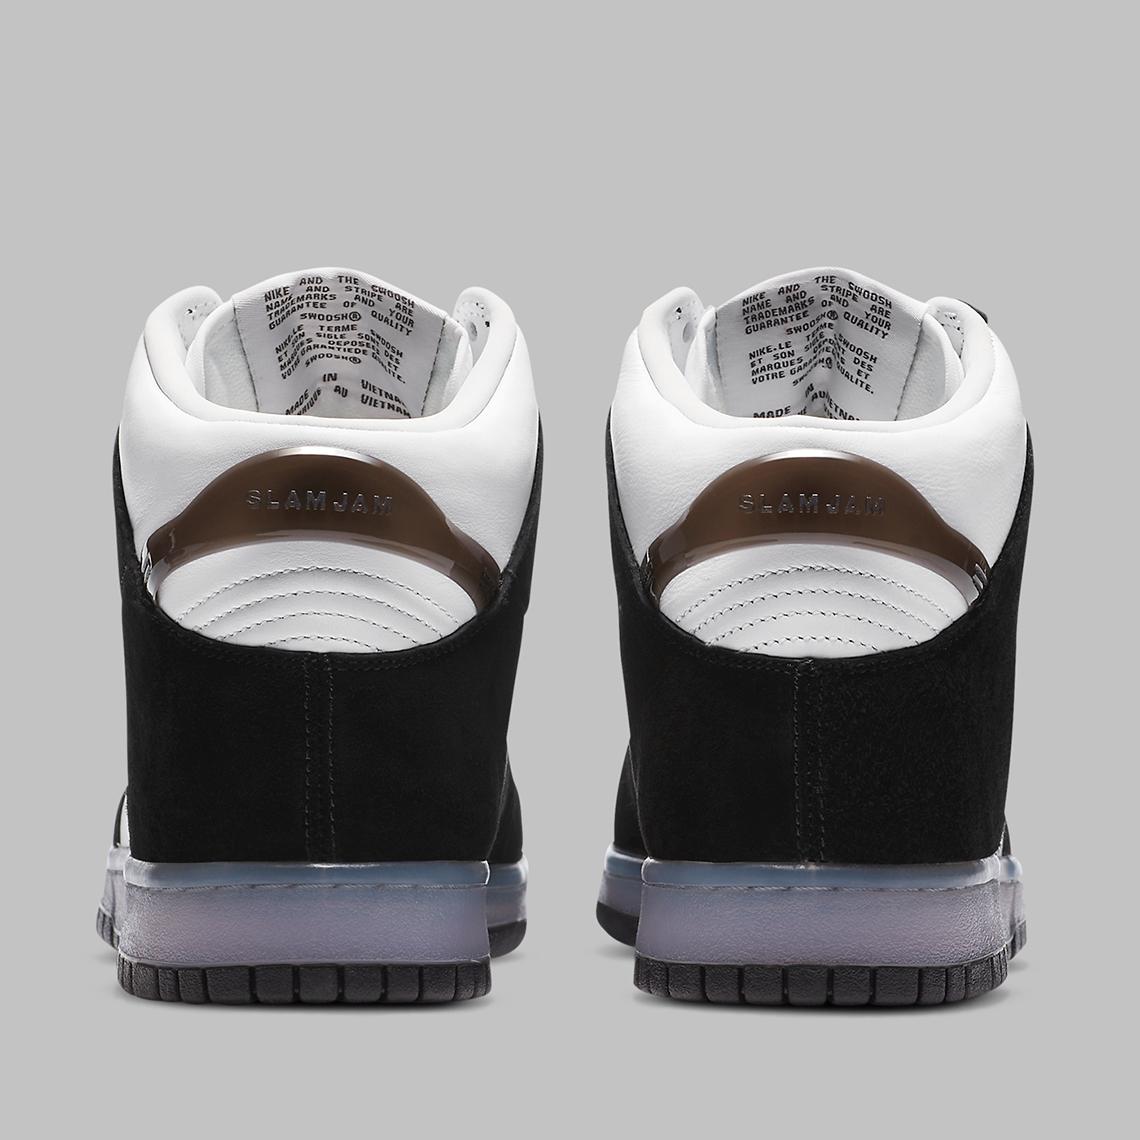 Slam Jam x Nike Dunk High ''Clear Black'' - DA1639-101